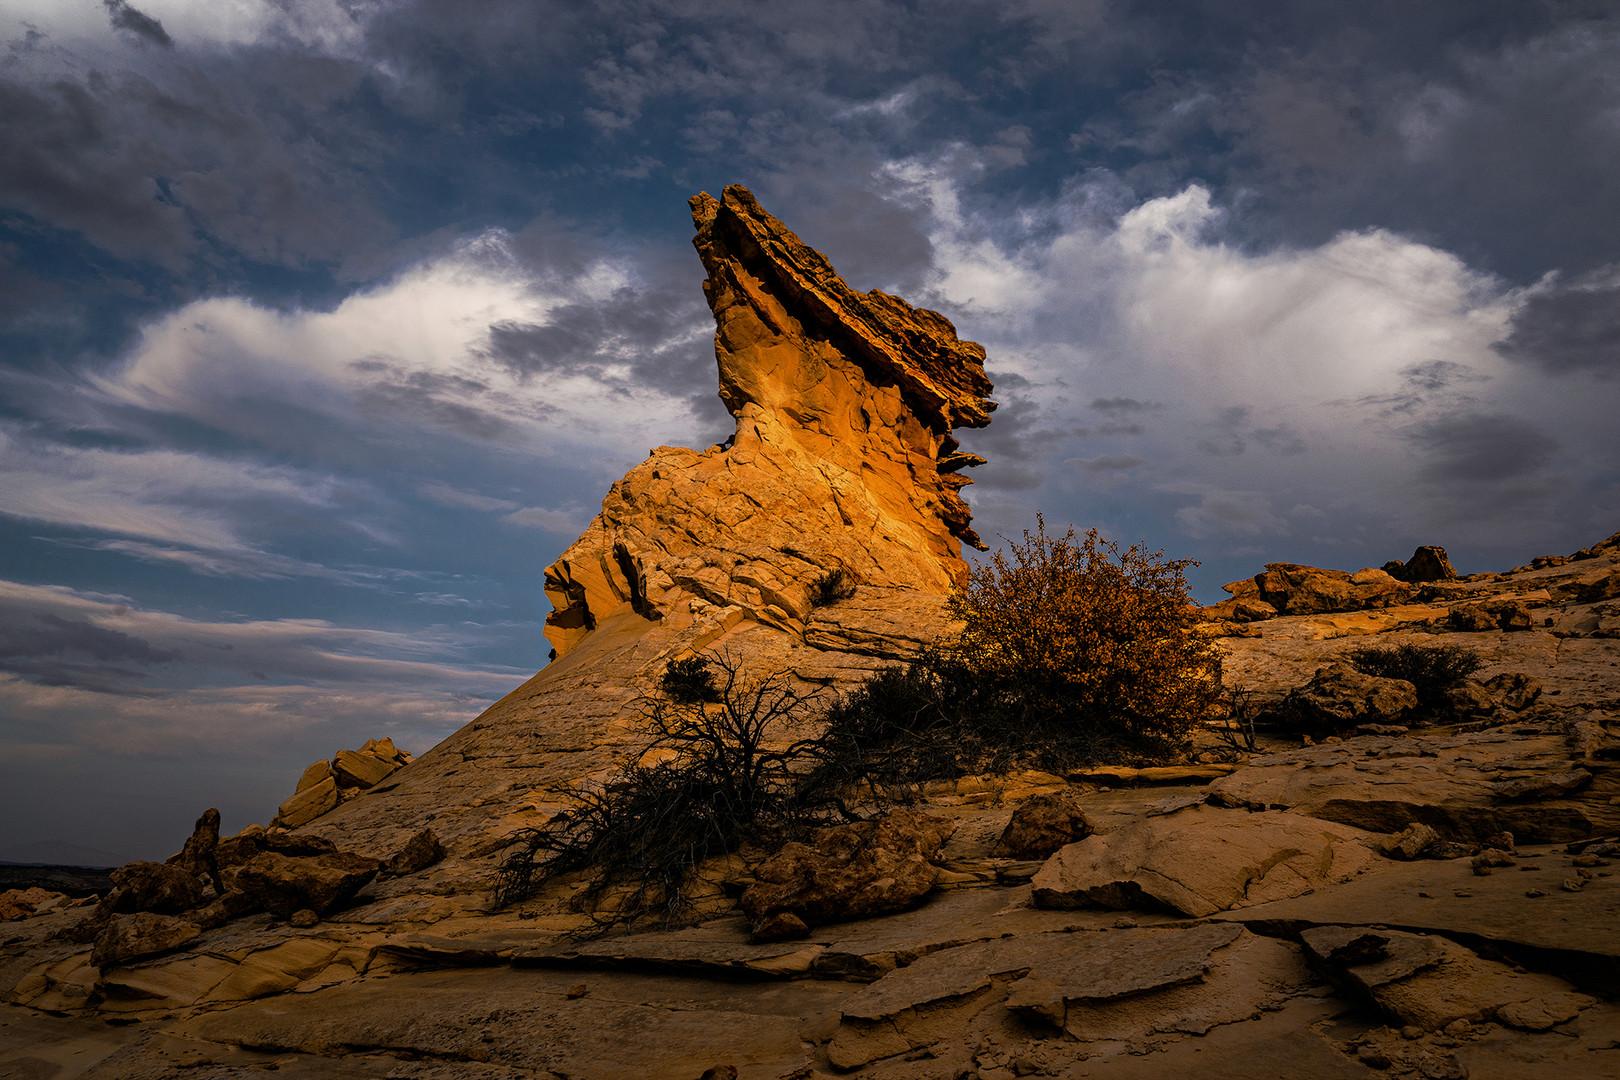 Image by Derek Hambrick: 2020 Utah's Hidden Gems